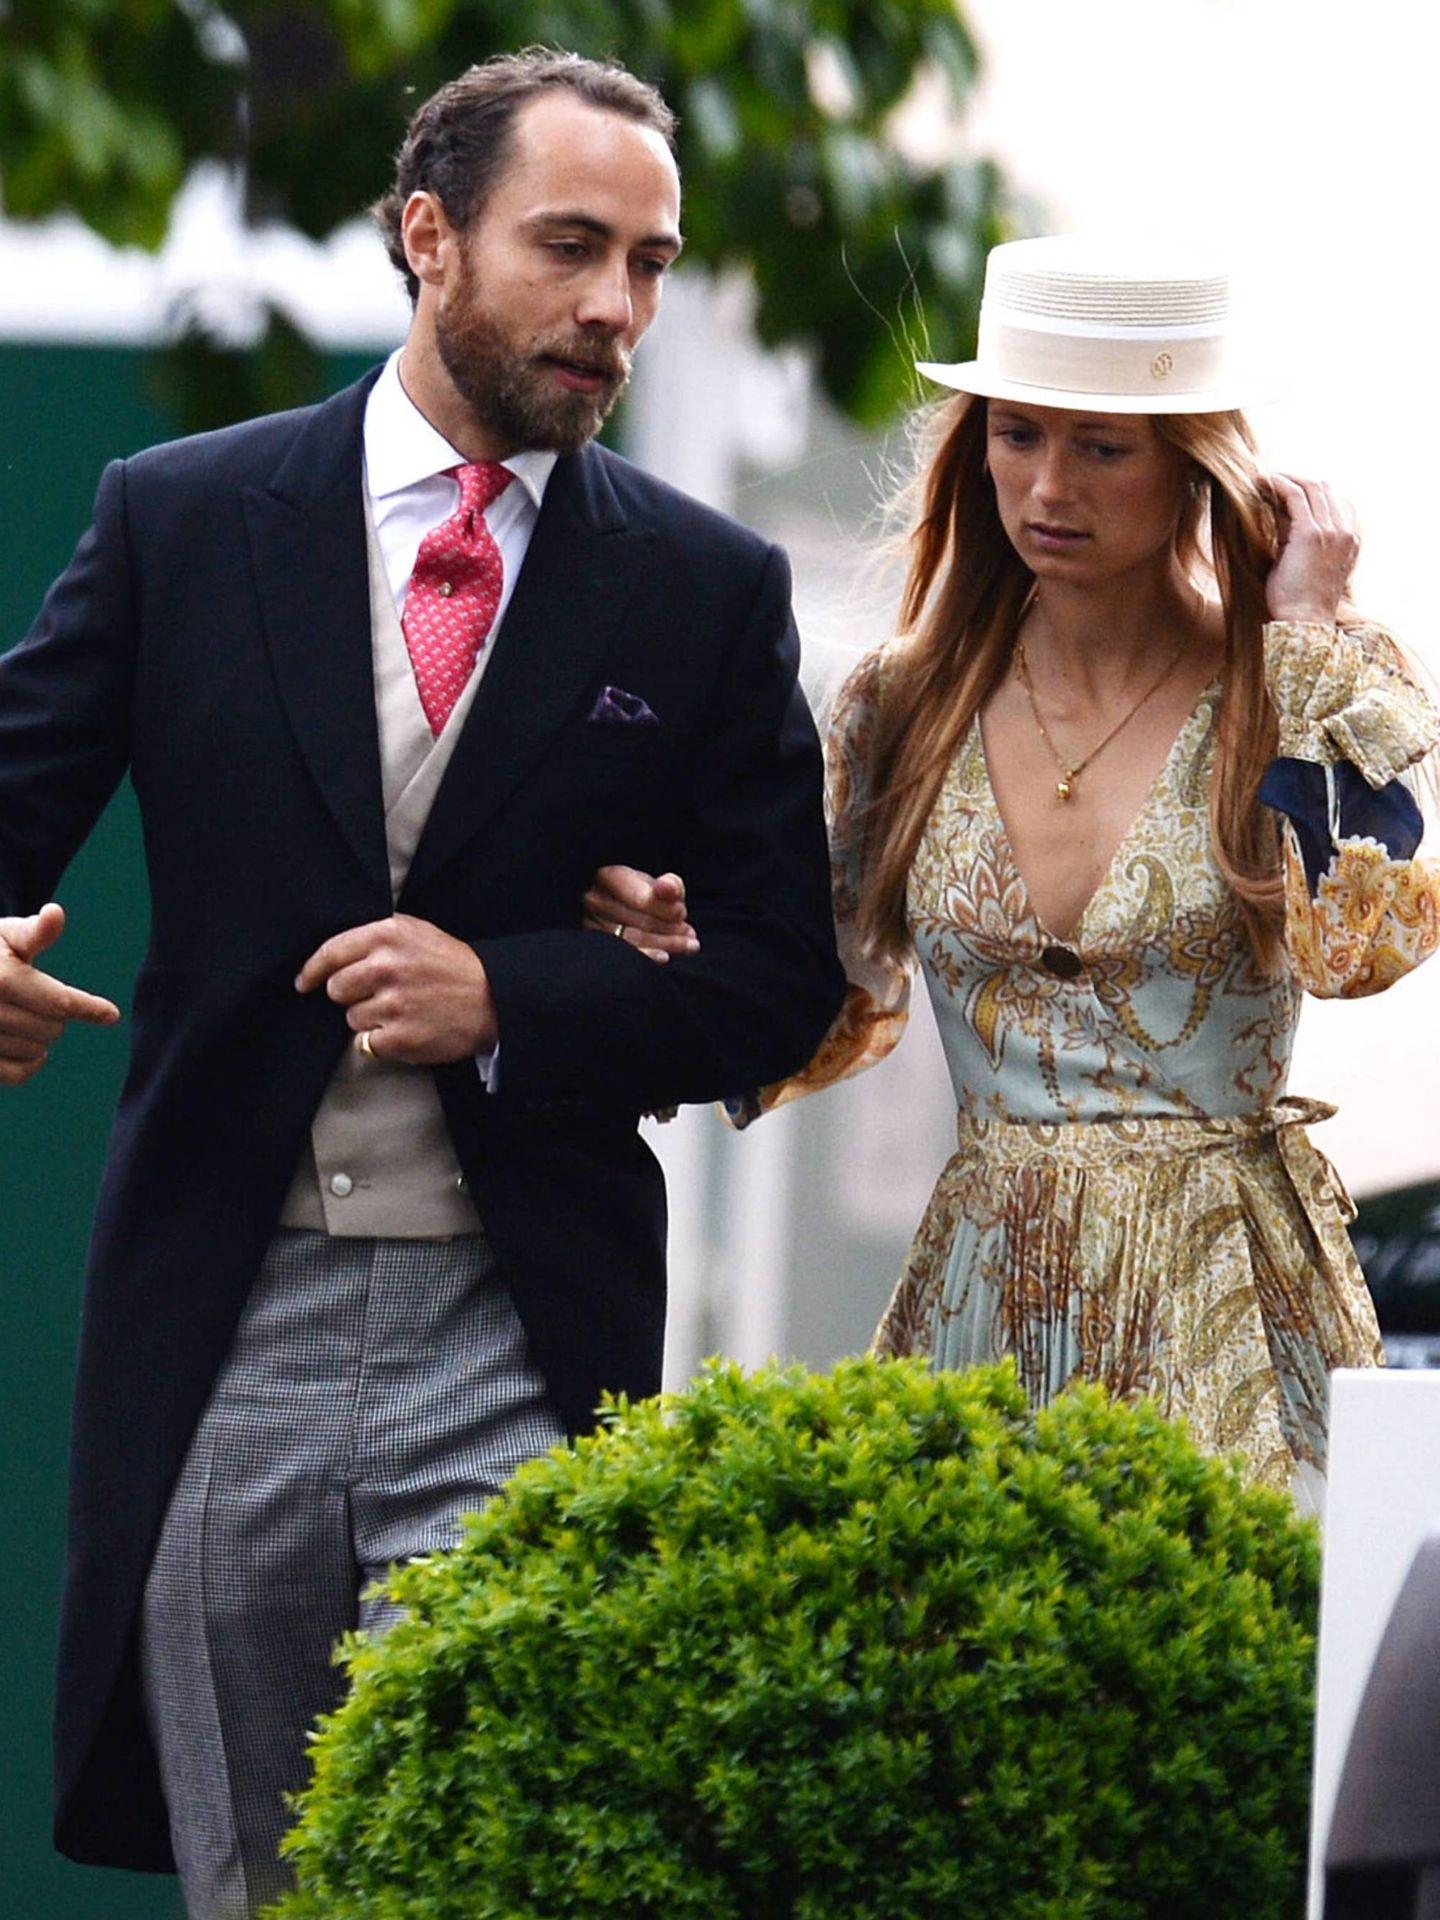 James Middleton y Alizee Thevenet, en la boda de Lady Gabriella Windsor. (Cordon Press)